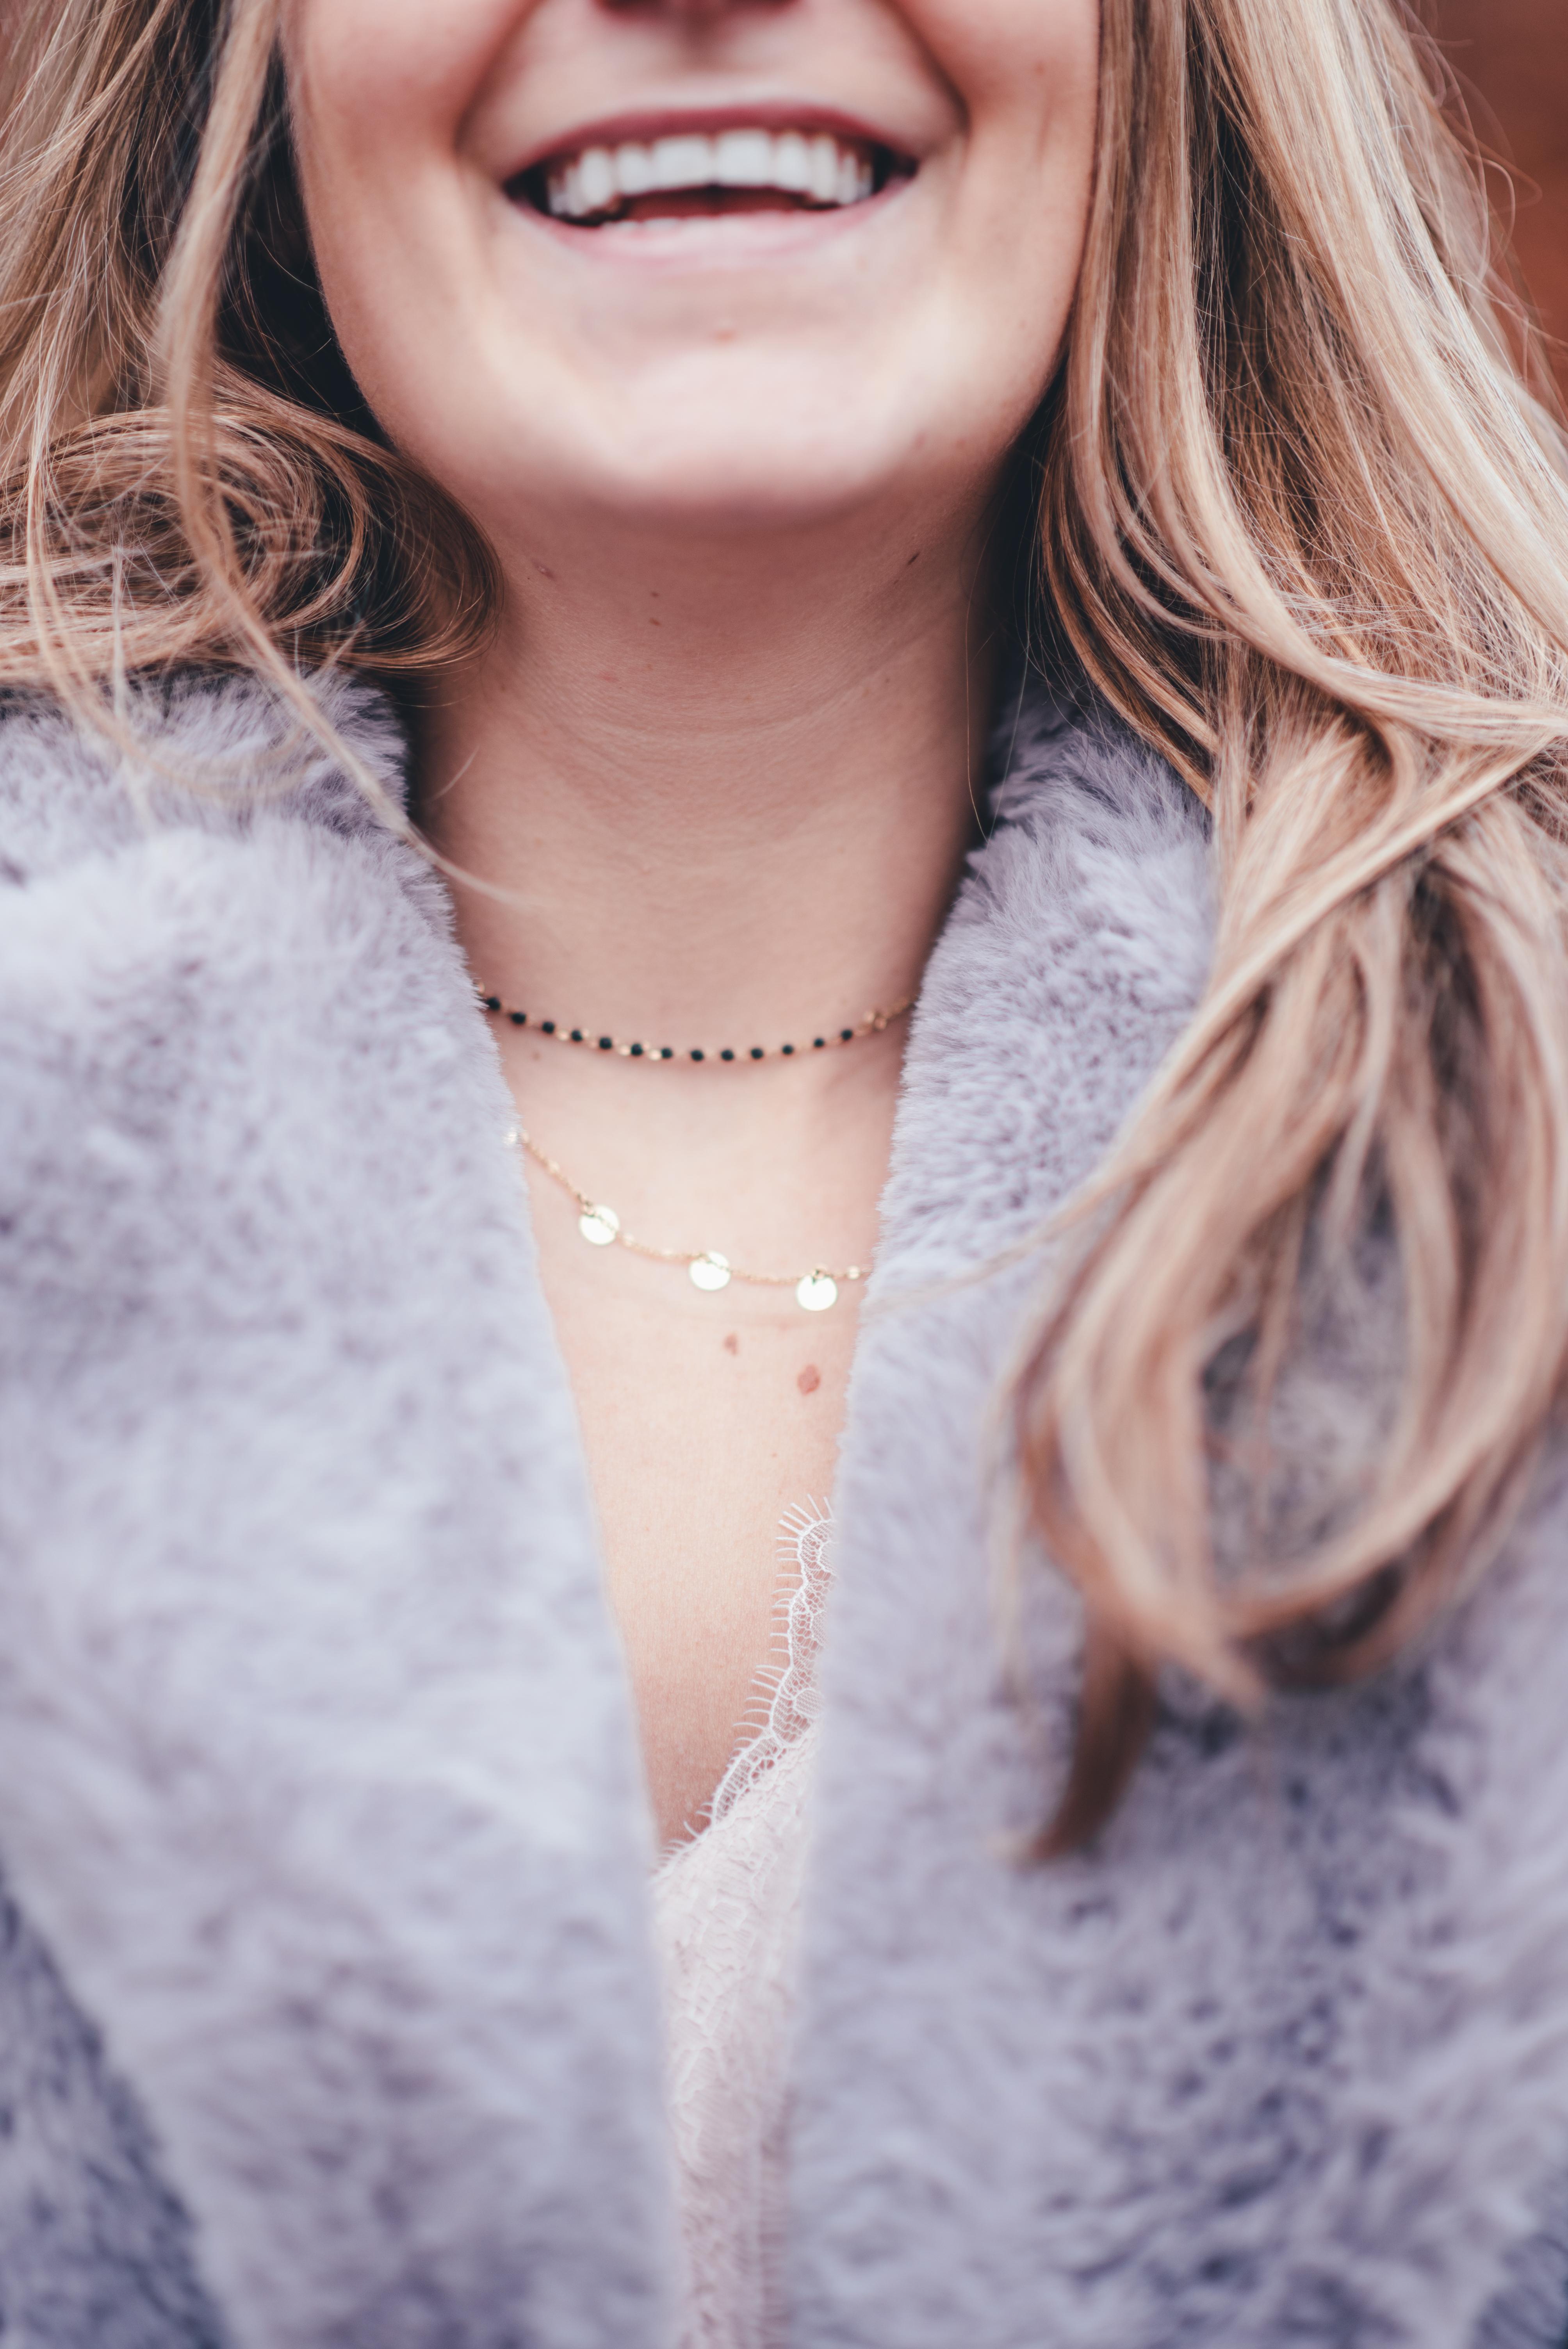 xmariekie, influencer, blog, blogger, winter, ootd, fake fur, coat, jacket, muts, bontjas, nepbont, sjaal, tasje, slang, slangenprint, zacht, ketting, jewelscouture, jewels, and couture, jewels, couture